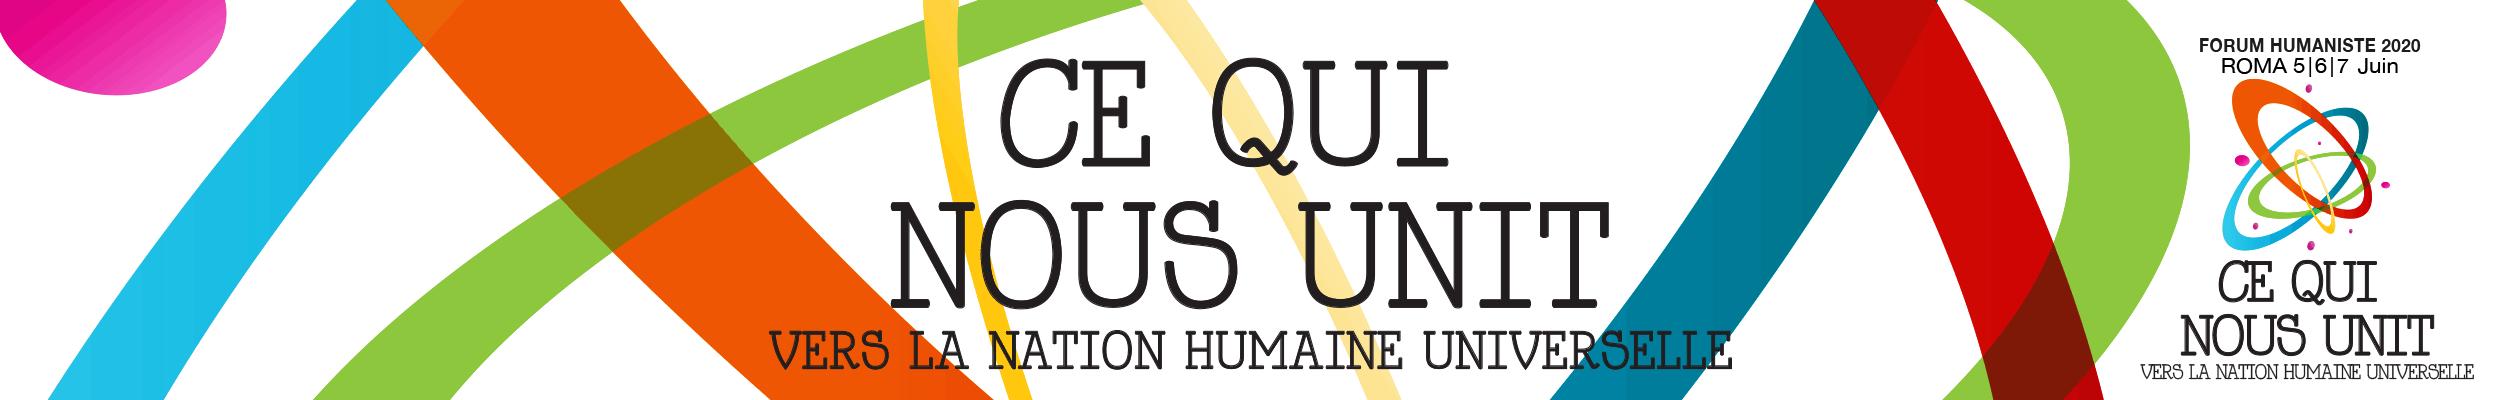 Forum Humaniste